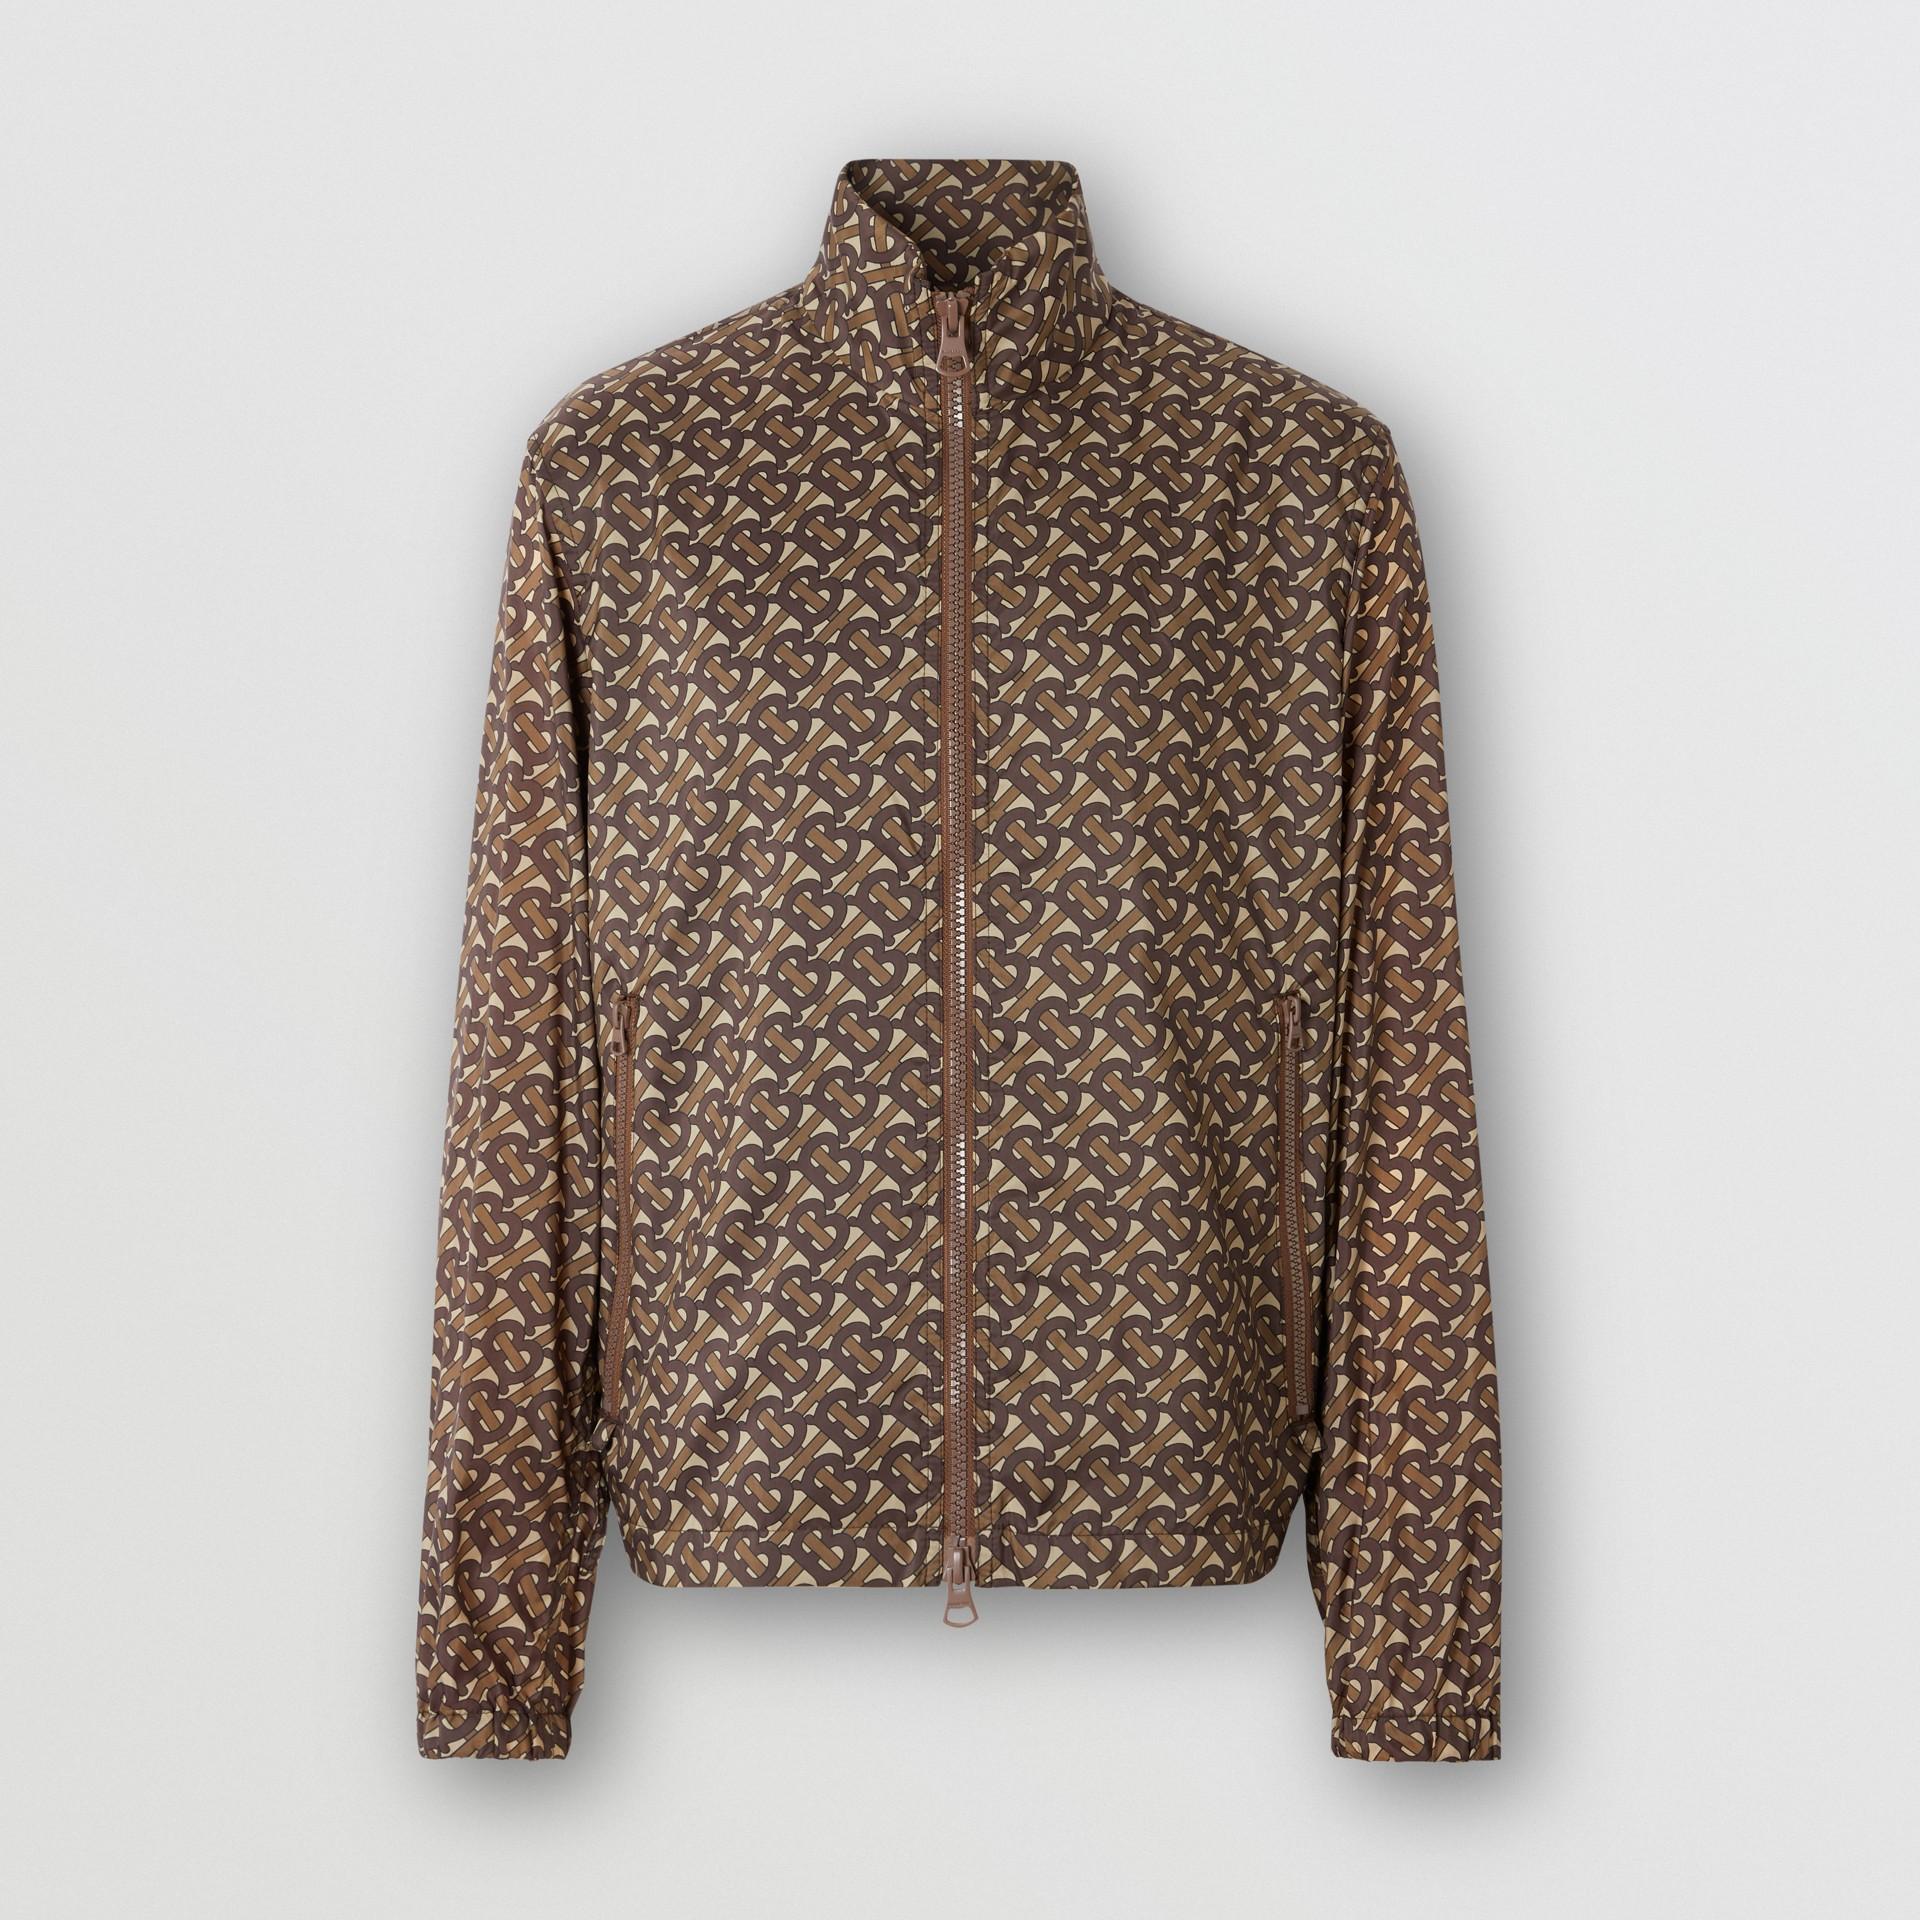 Cotton Harrington Jacket with Detachable Warmer in Honey - Men | Burberry - gallery image 6